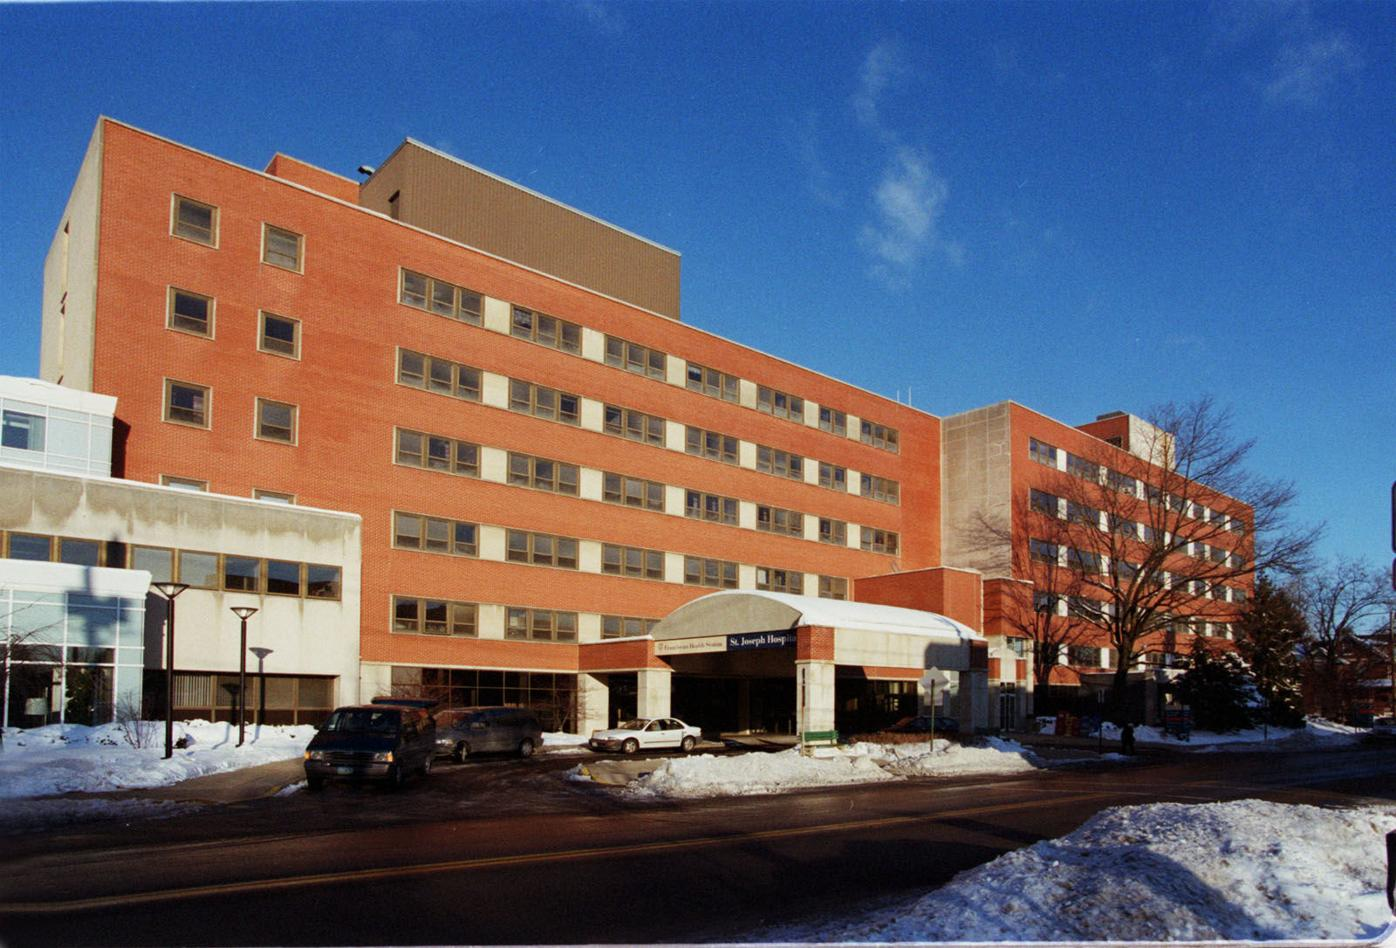 St. Joseph Hospital in 2000 file photo